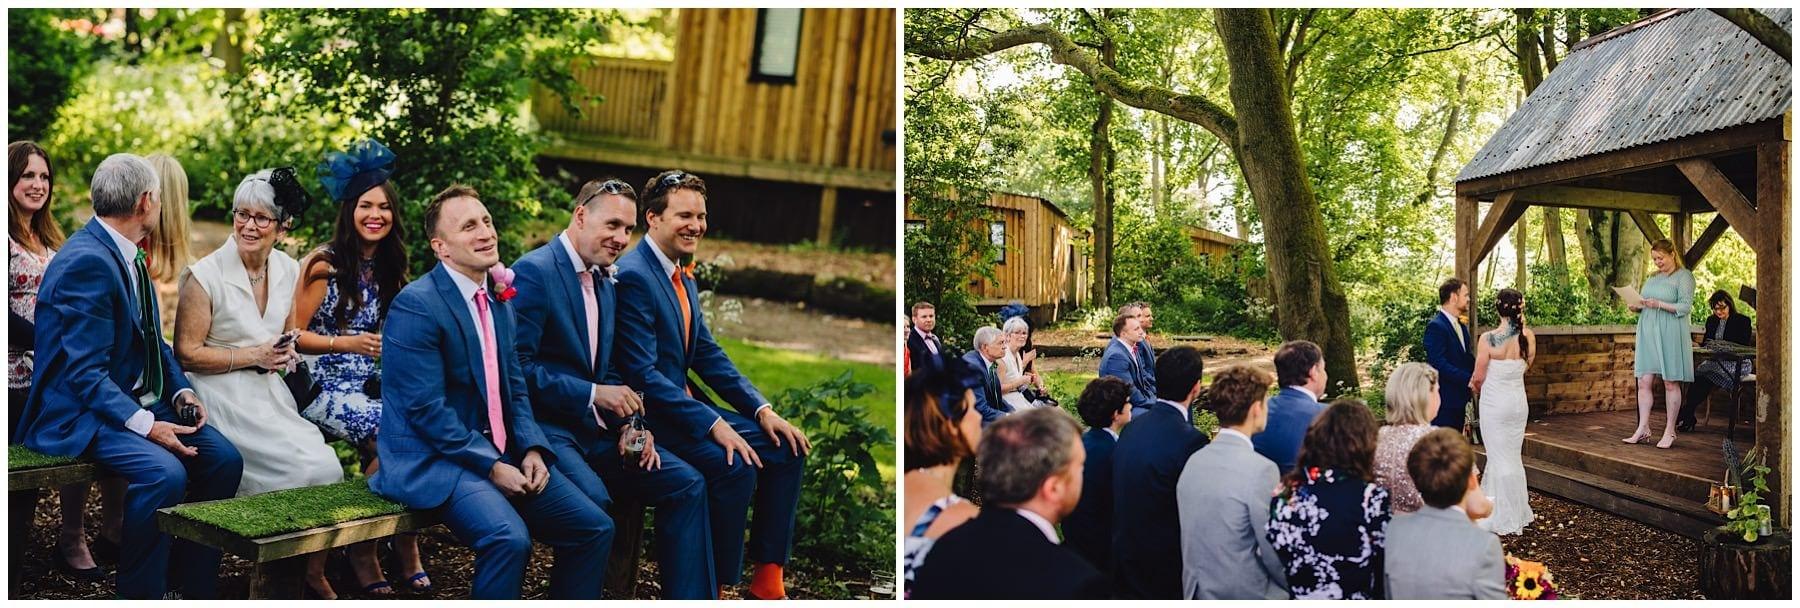 Hothorp Hall Woodlands Wedding Photographer 19